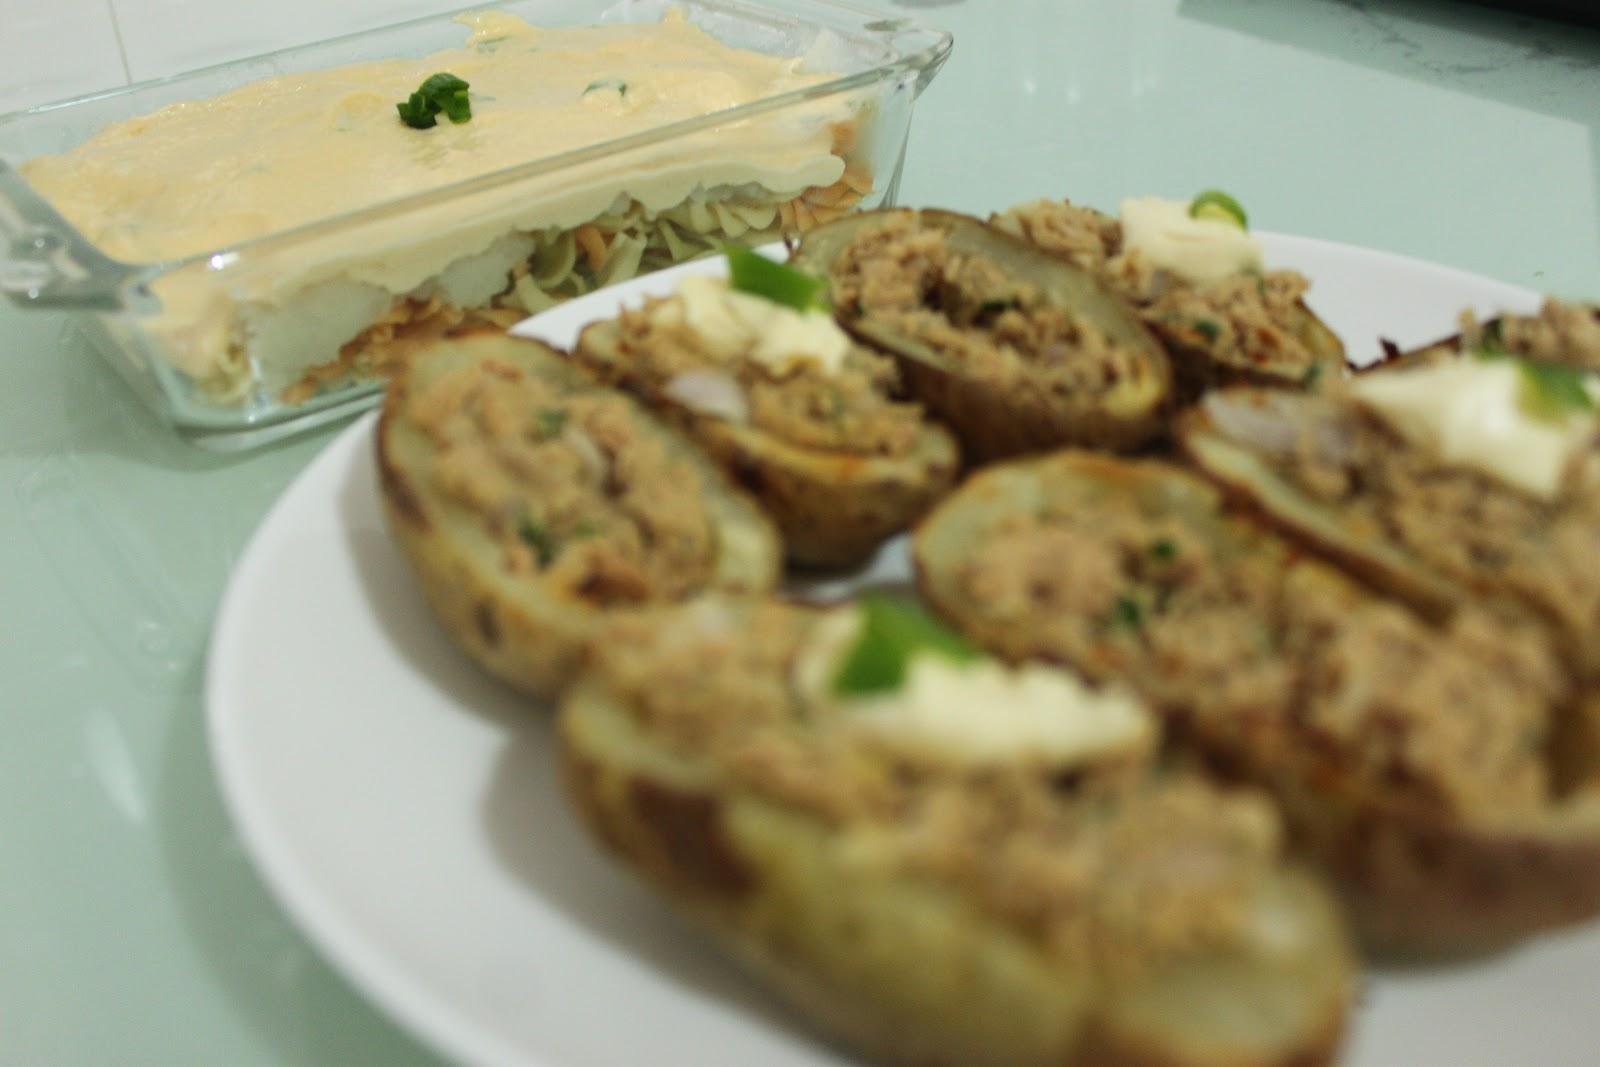 ... up, it's good for you. : Tuna melt potato skin + Alfredo spiral pasta